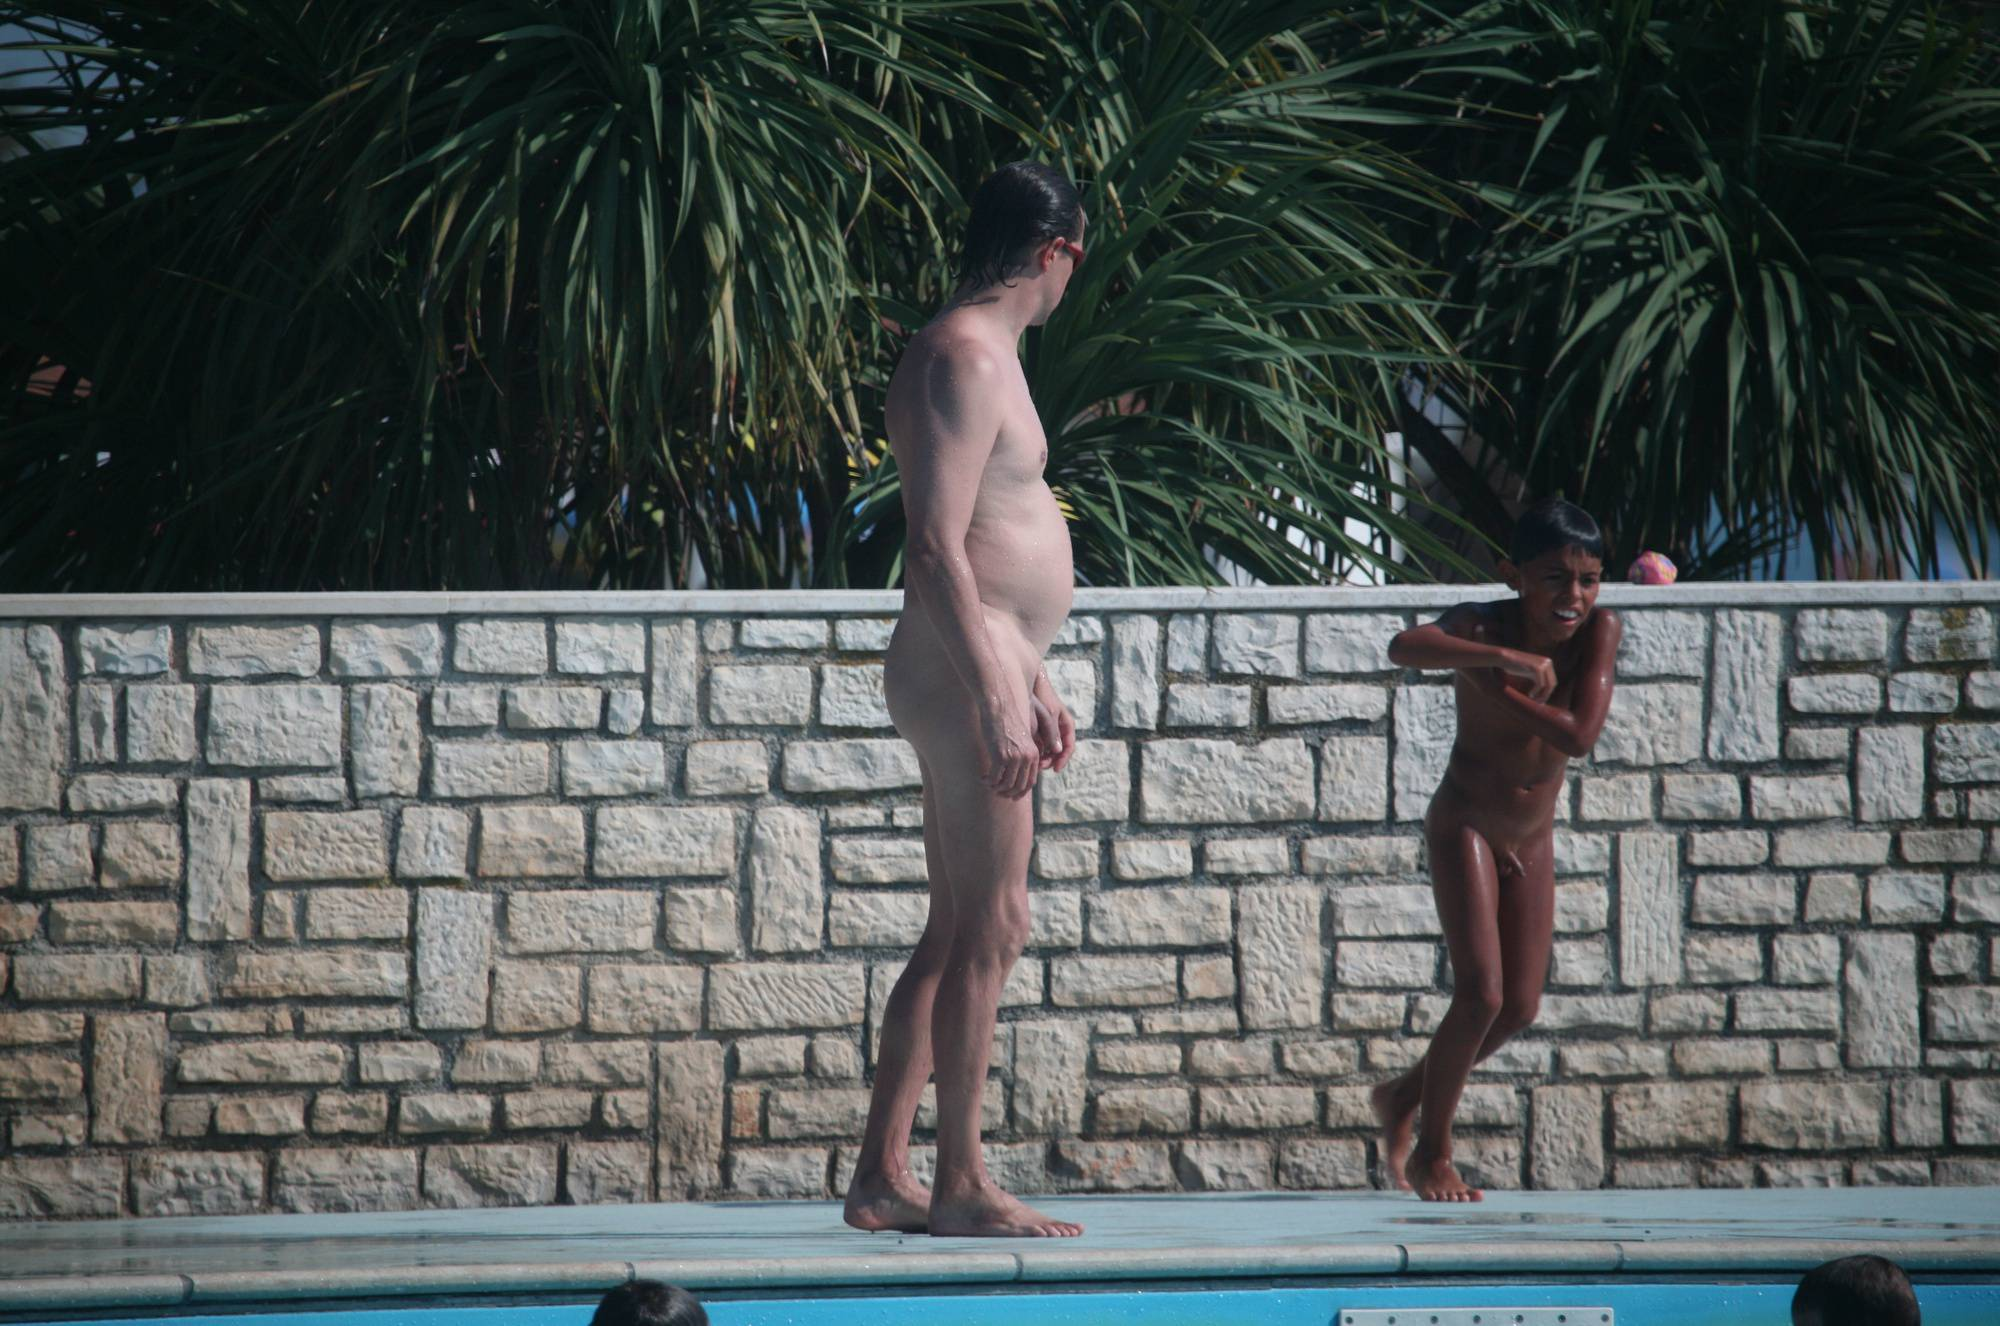 Naturist Sibling Pool Wars - 2